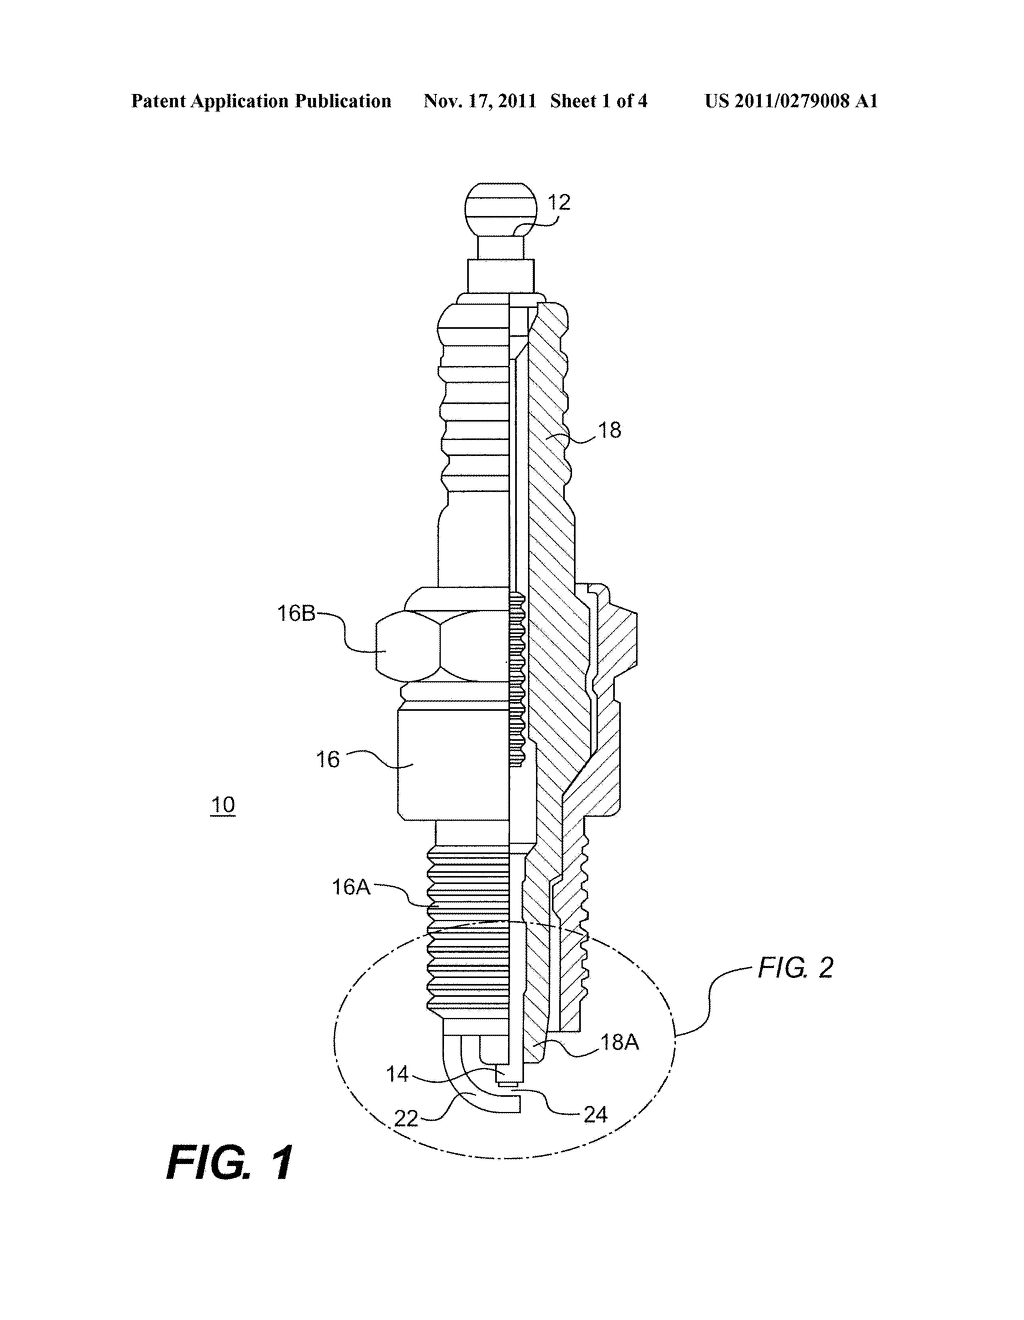 hight resolution of spark plug diagram schematic and image 02 tattoos diagram spark plug diagram schematic